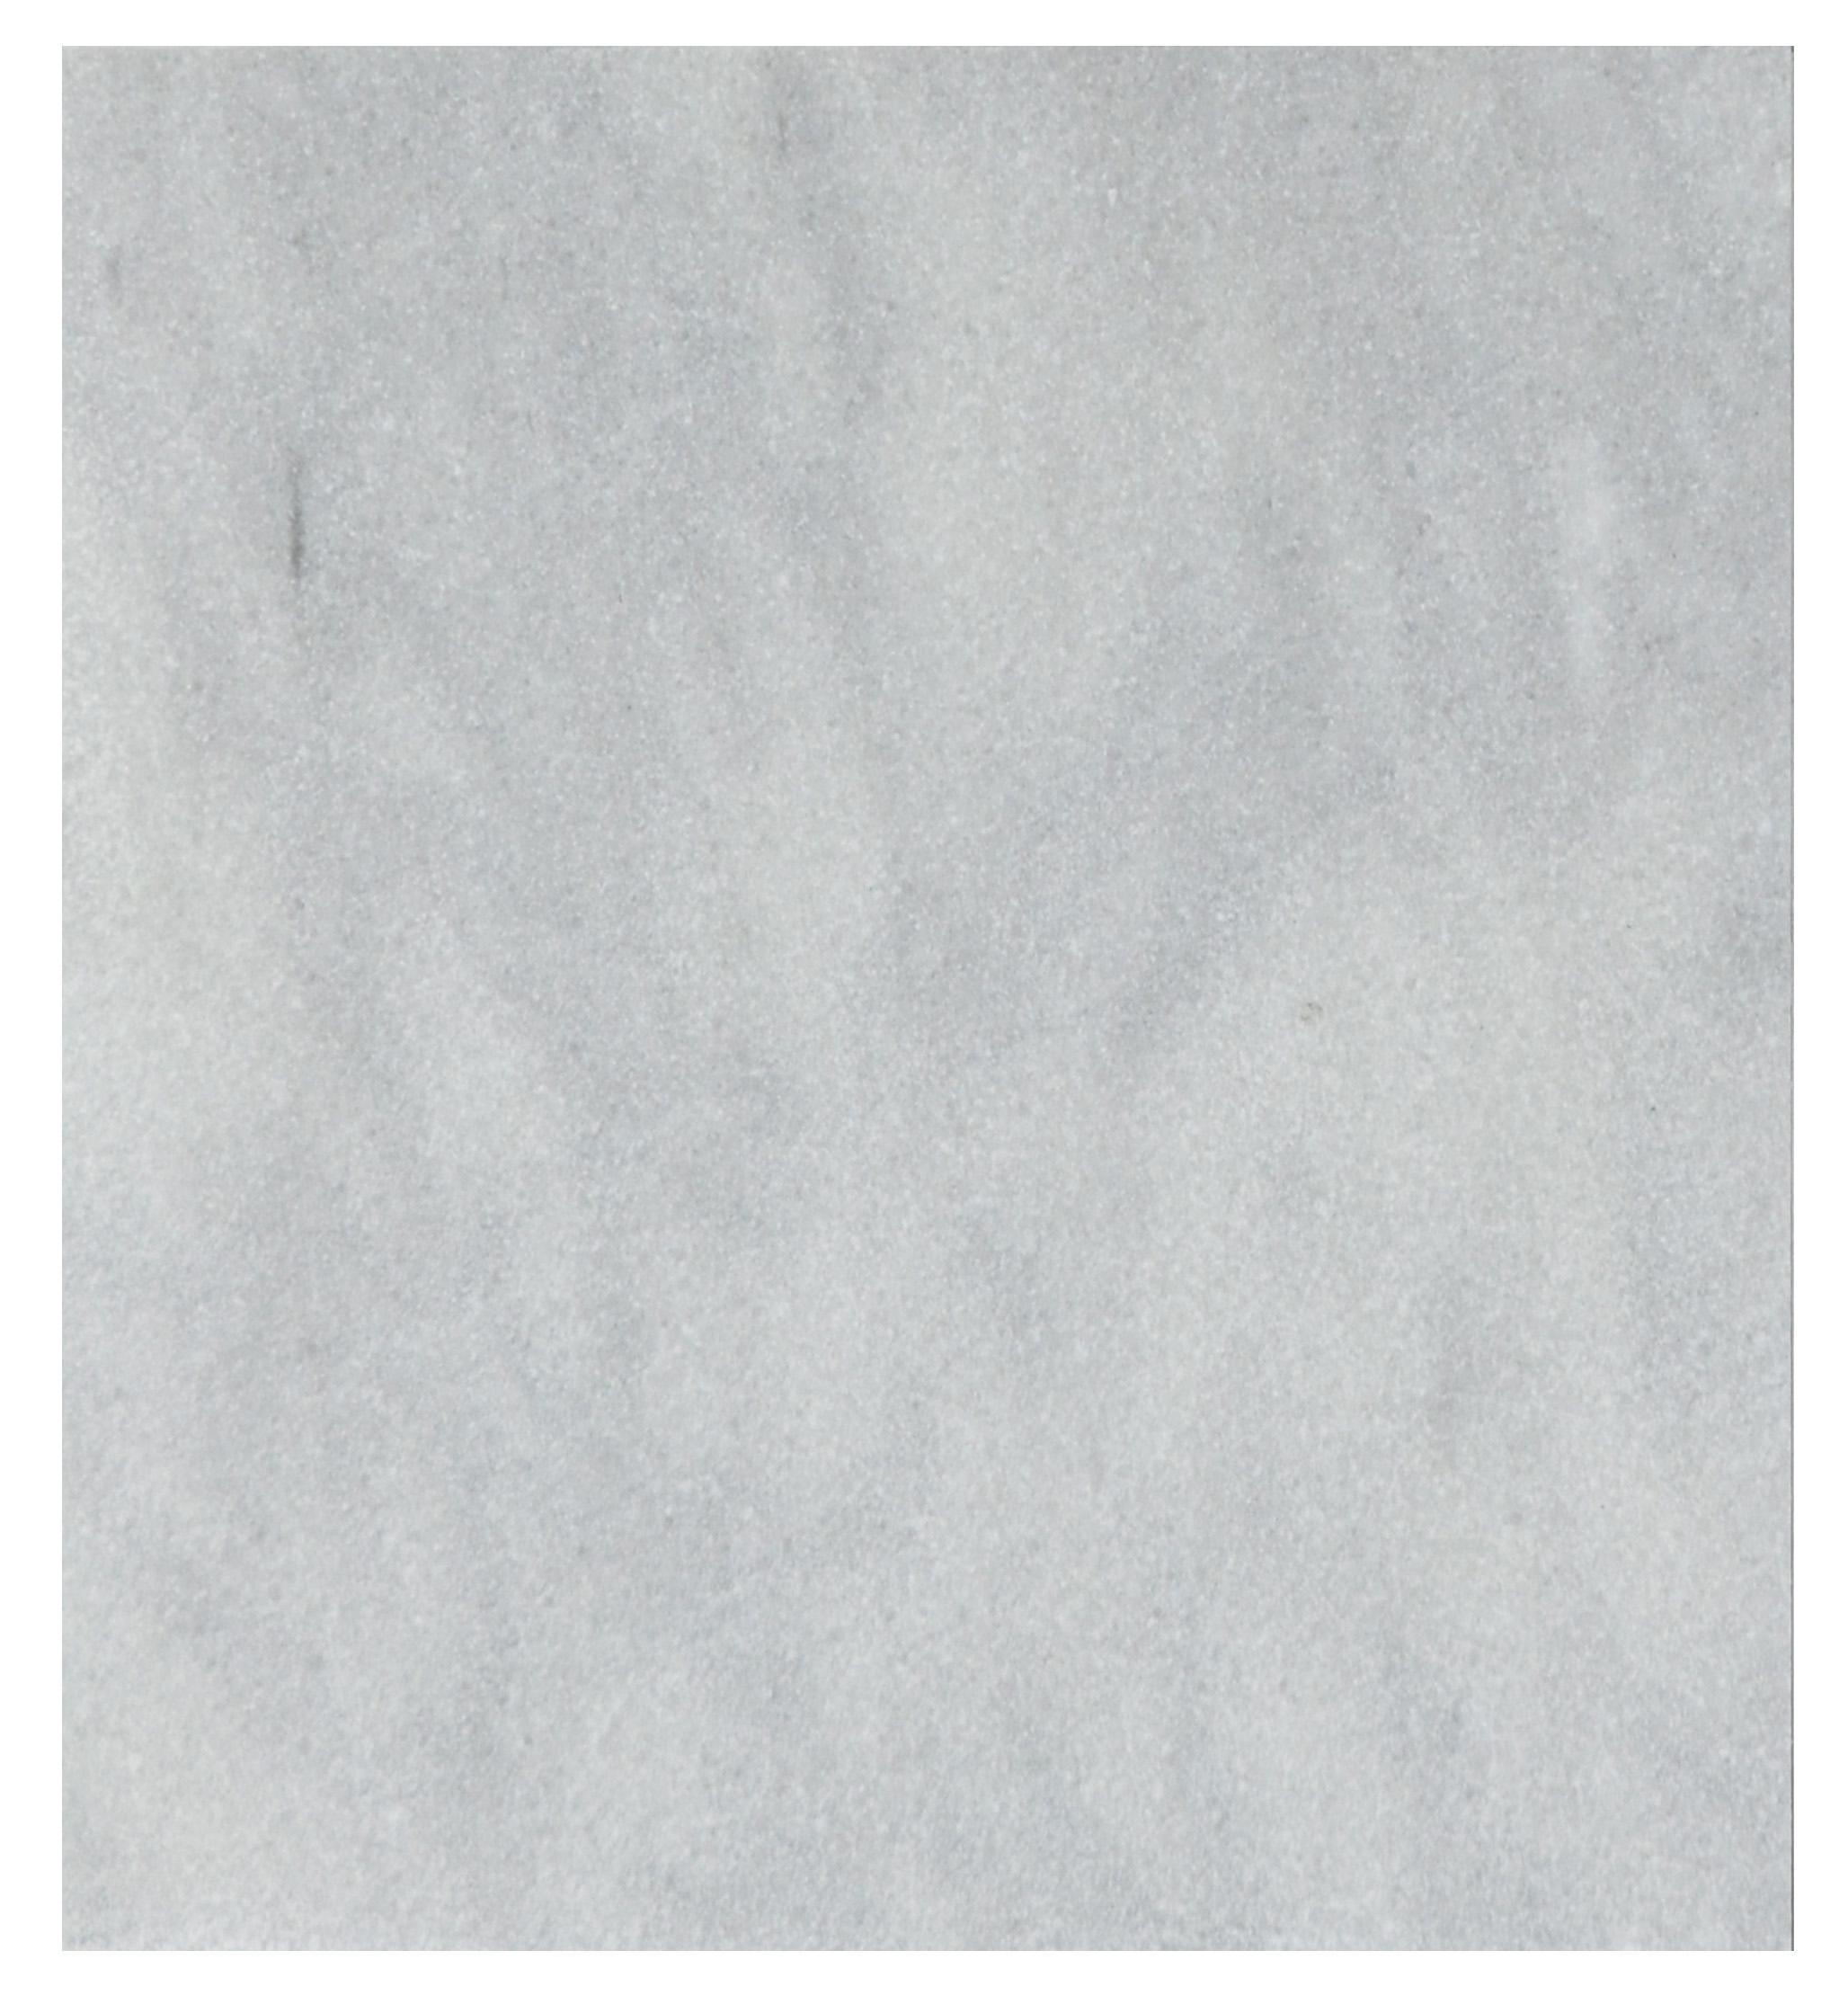 white fume sandblasted marble tiles 18x18-marble sale-Atlantic Stone Source